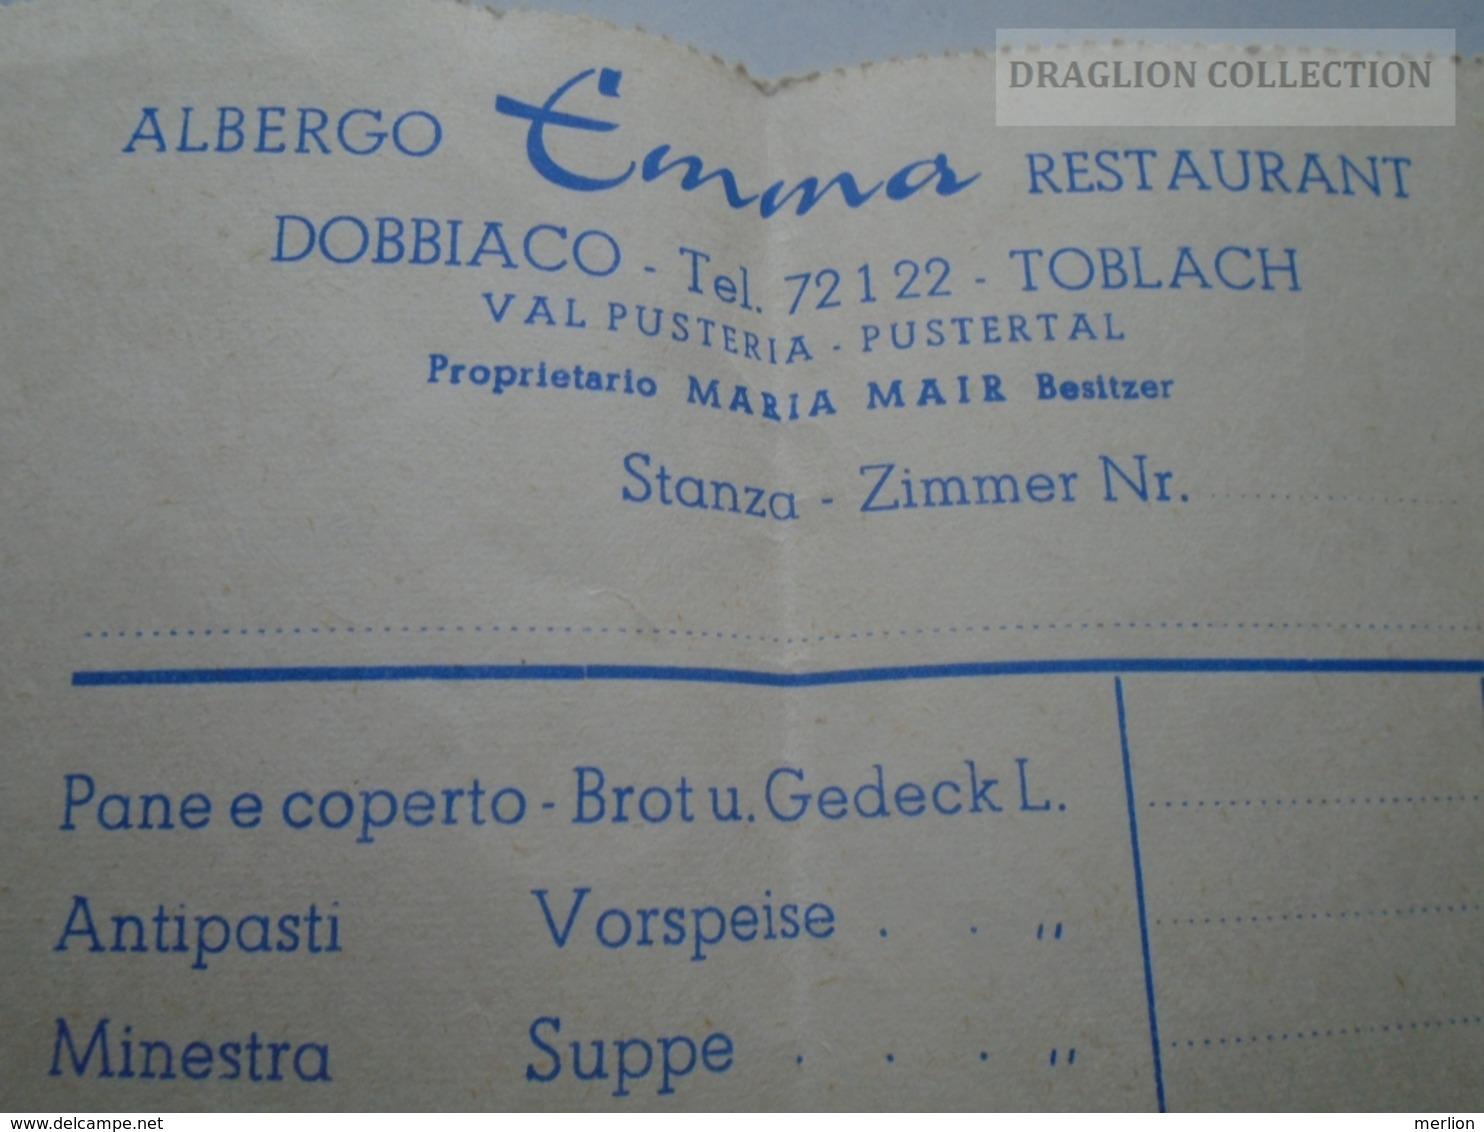 ZA192.36  Italia Albergo Emma -Restaurant - DOBBIACO-TOLBACH  Pustertal -Val Pusteria Invoice - Italia